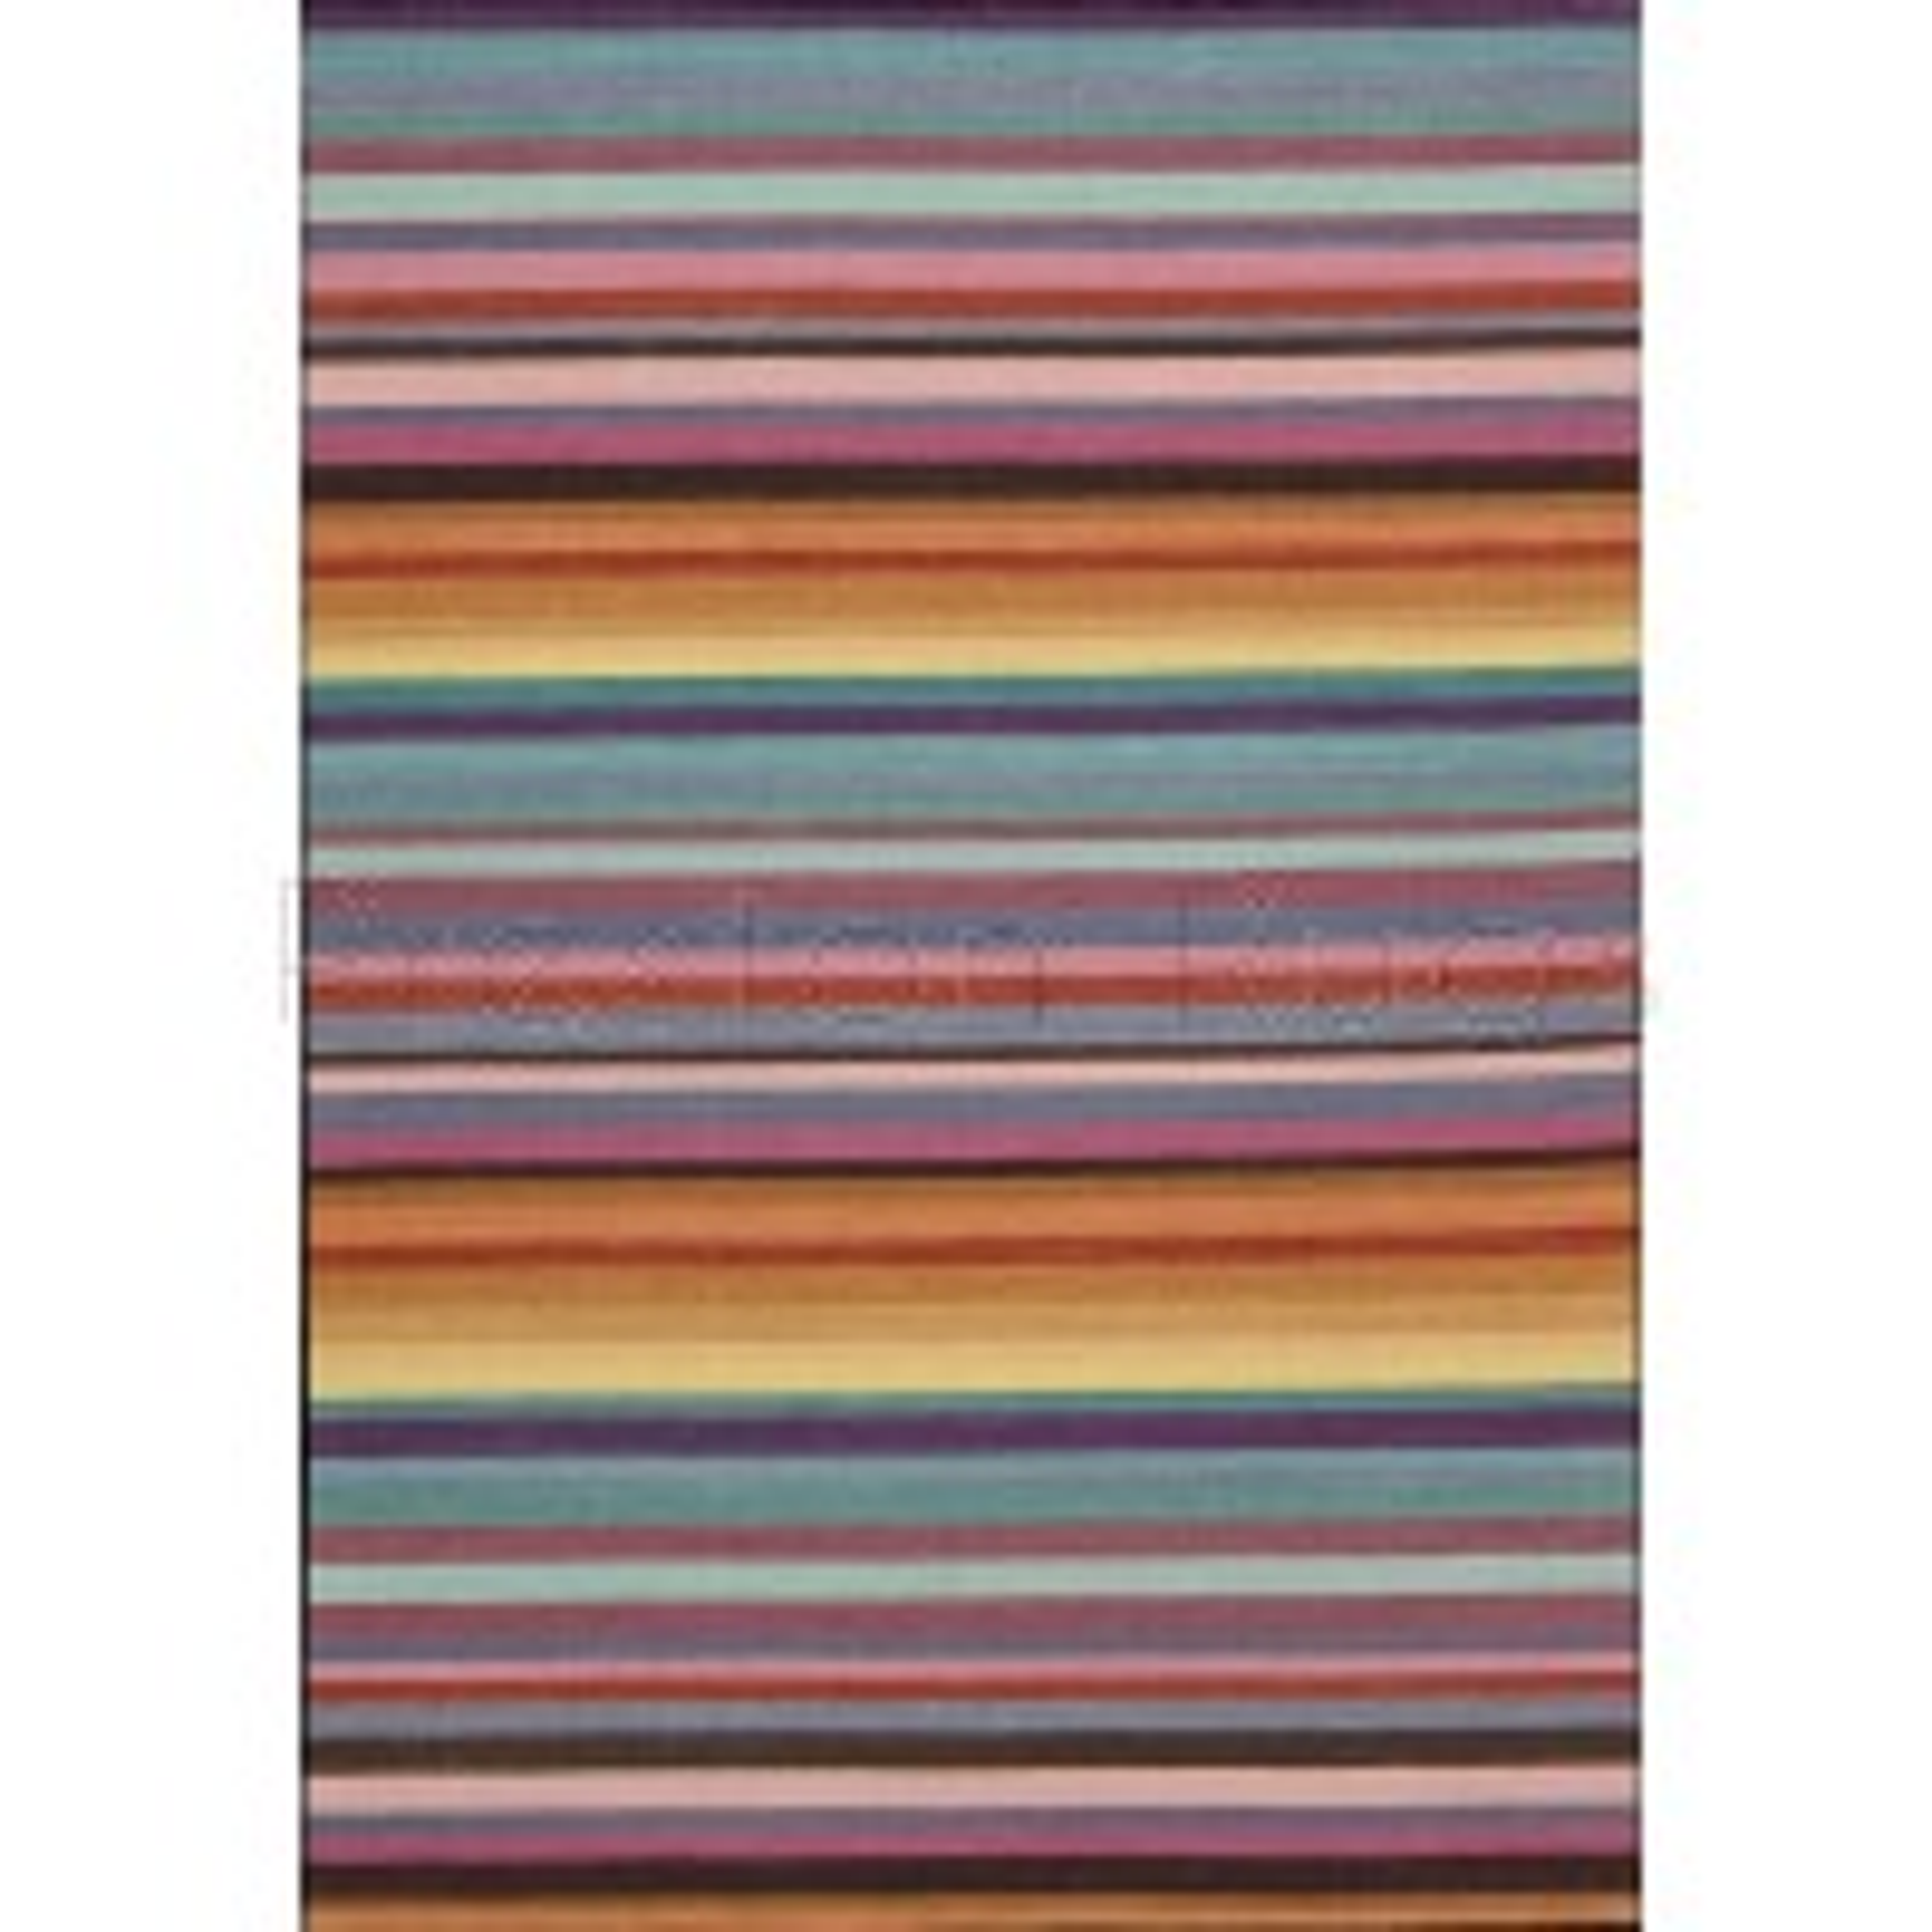 "Griot Stripe Rug - Uhadi - KI807 Chili Pepper-76 x 122 cm (2'6"" x 4')"